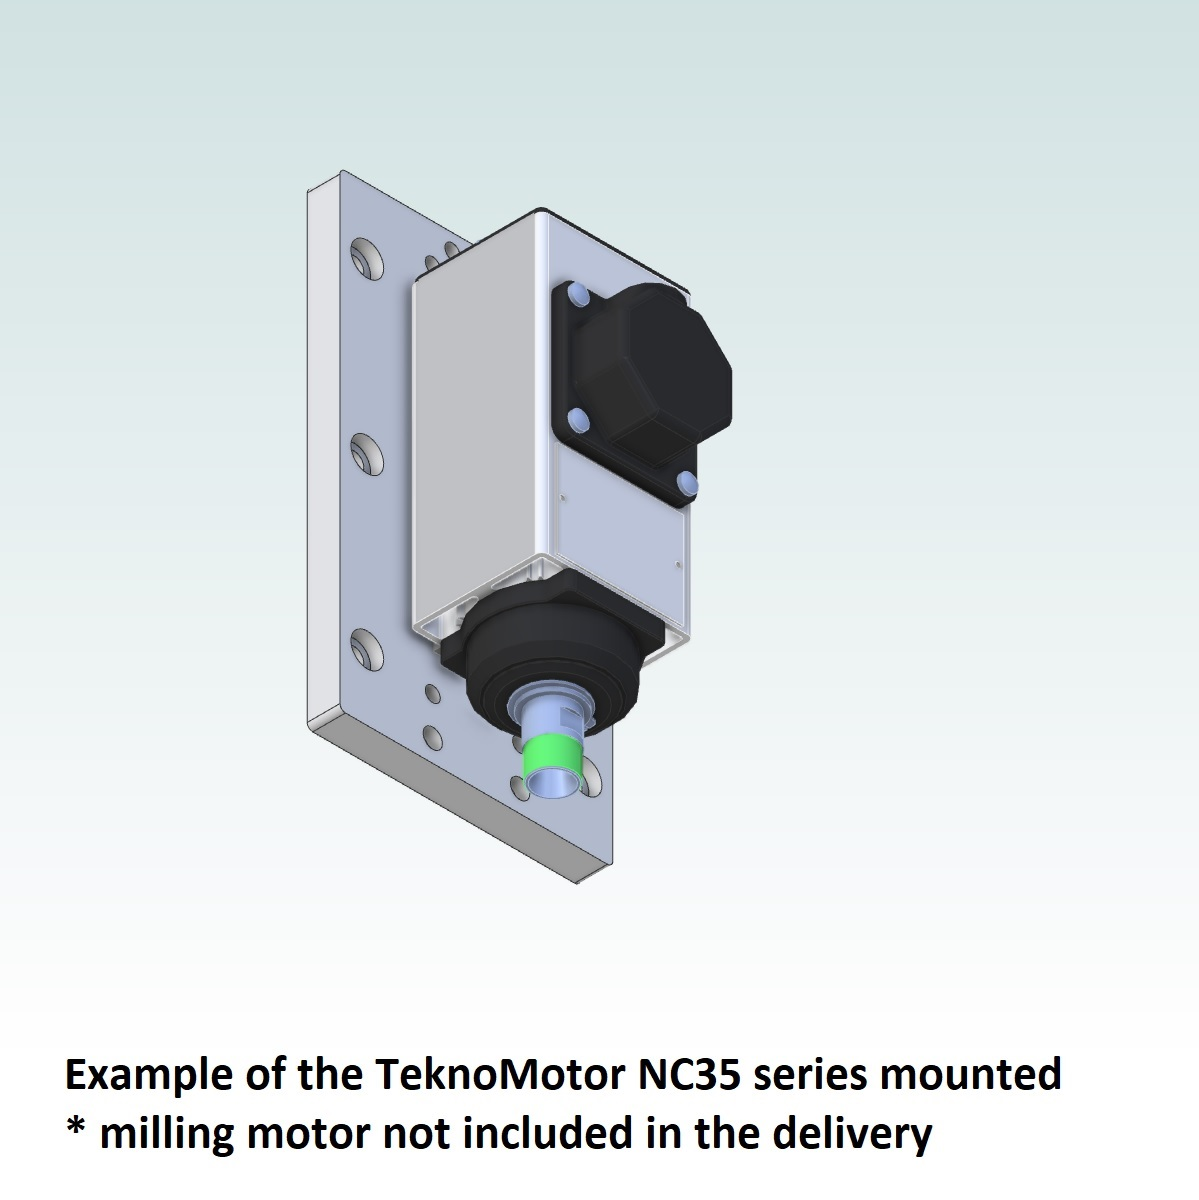 42715 teknomotor mountingplate icp4030 example with teknomotor nc35 mounted